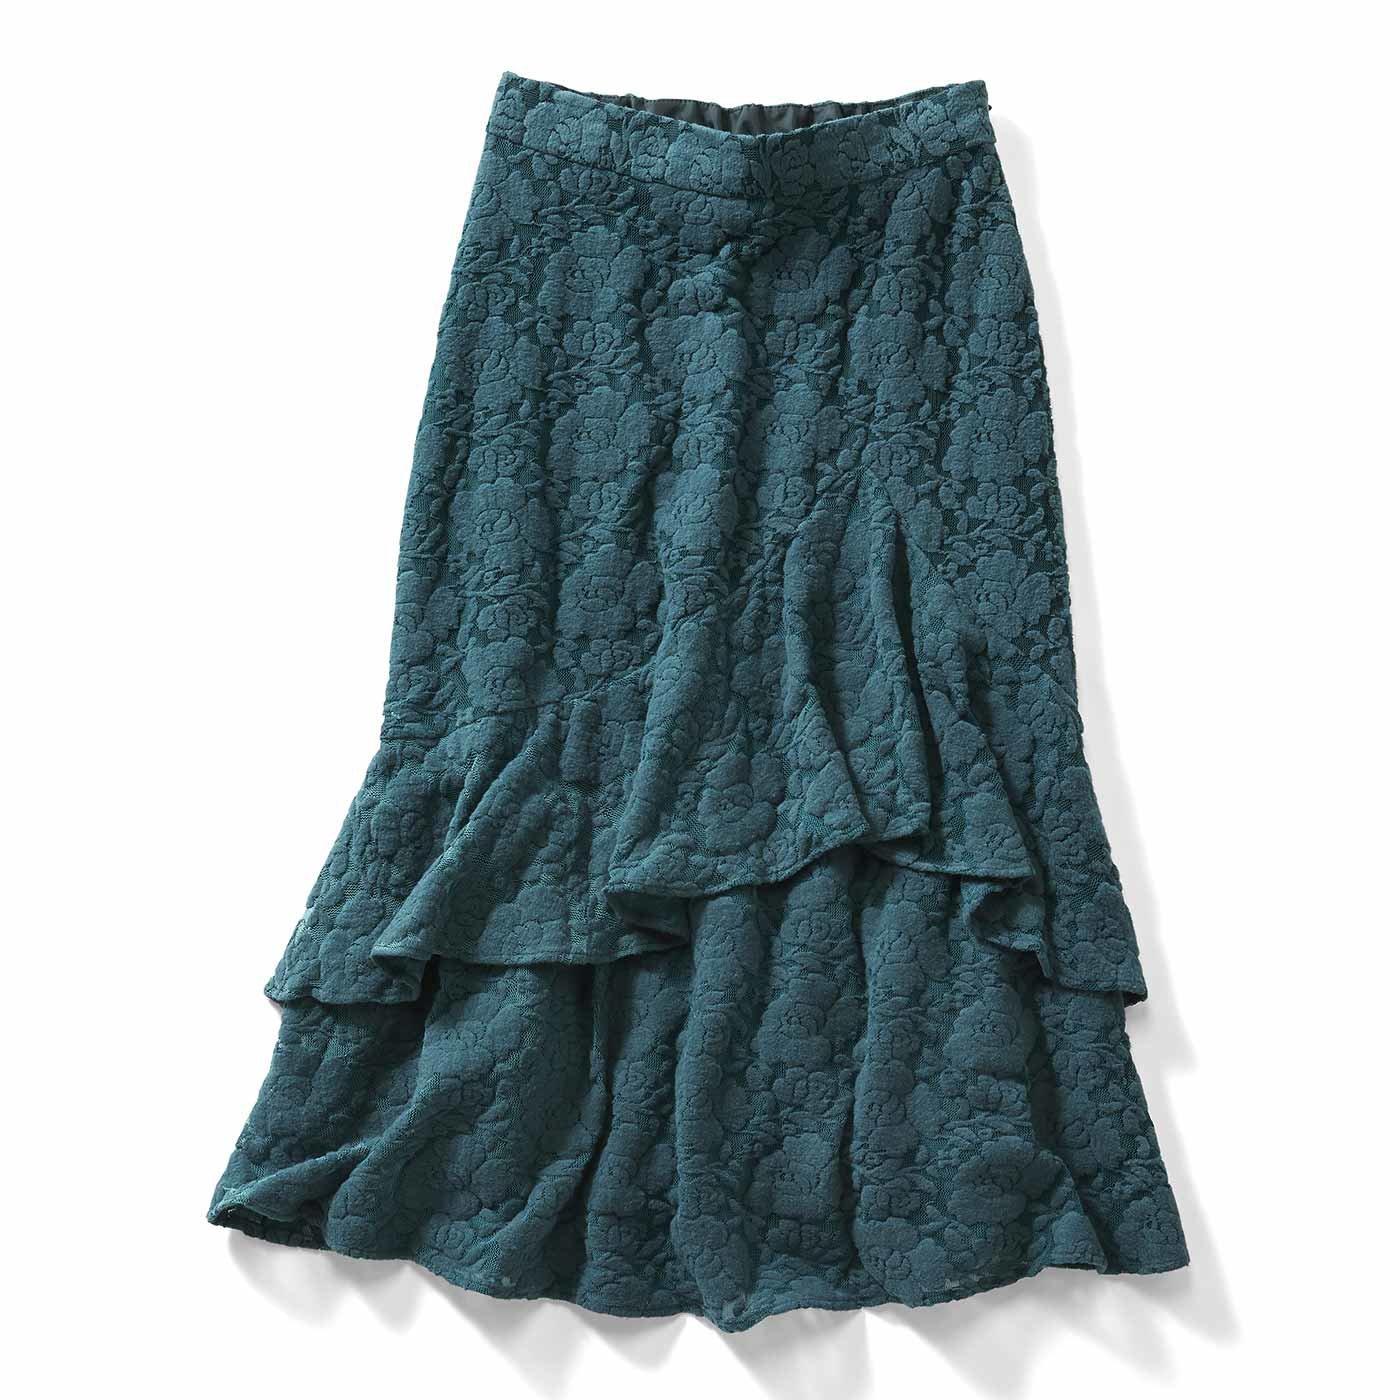 IEDIT[イディット] 起毛レースがリッチで大人っぽい アシメトリーフレアーのミディースカート〈ブルーグリーン〉